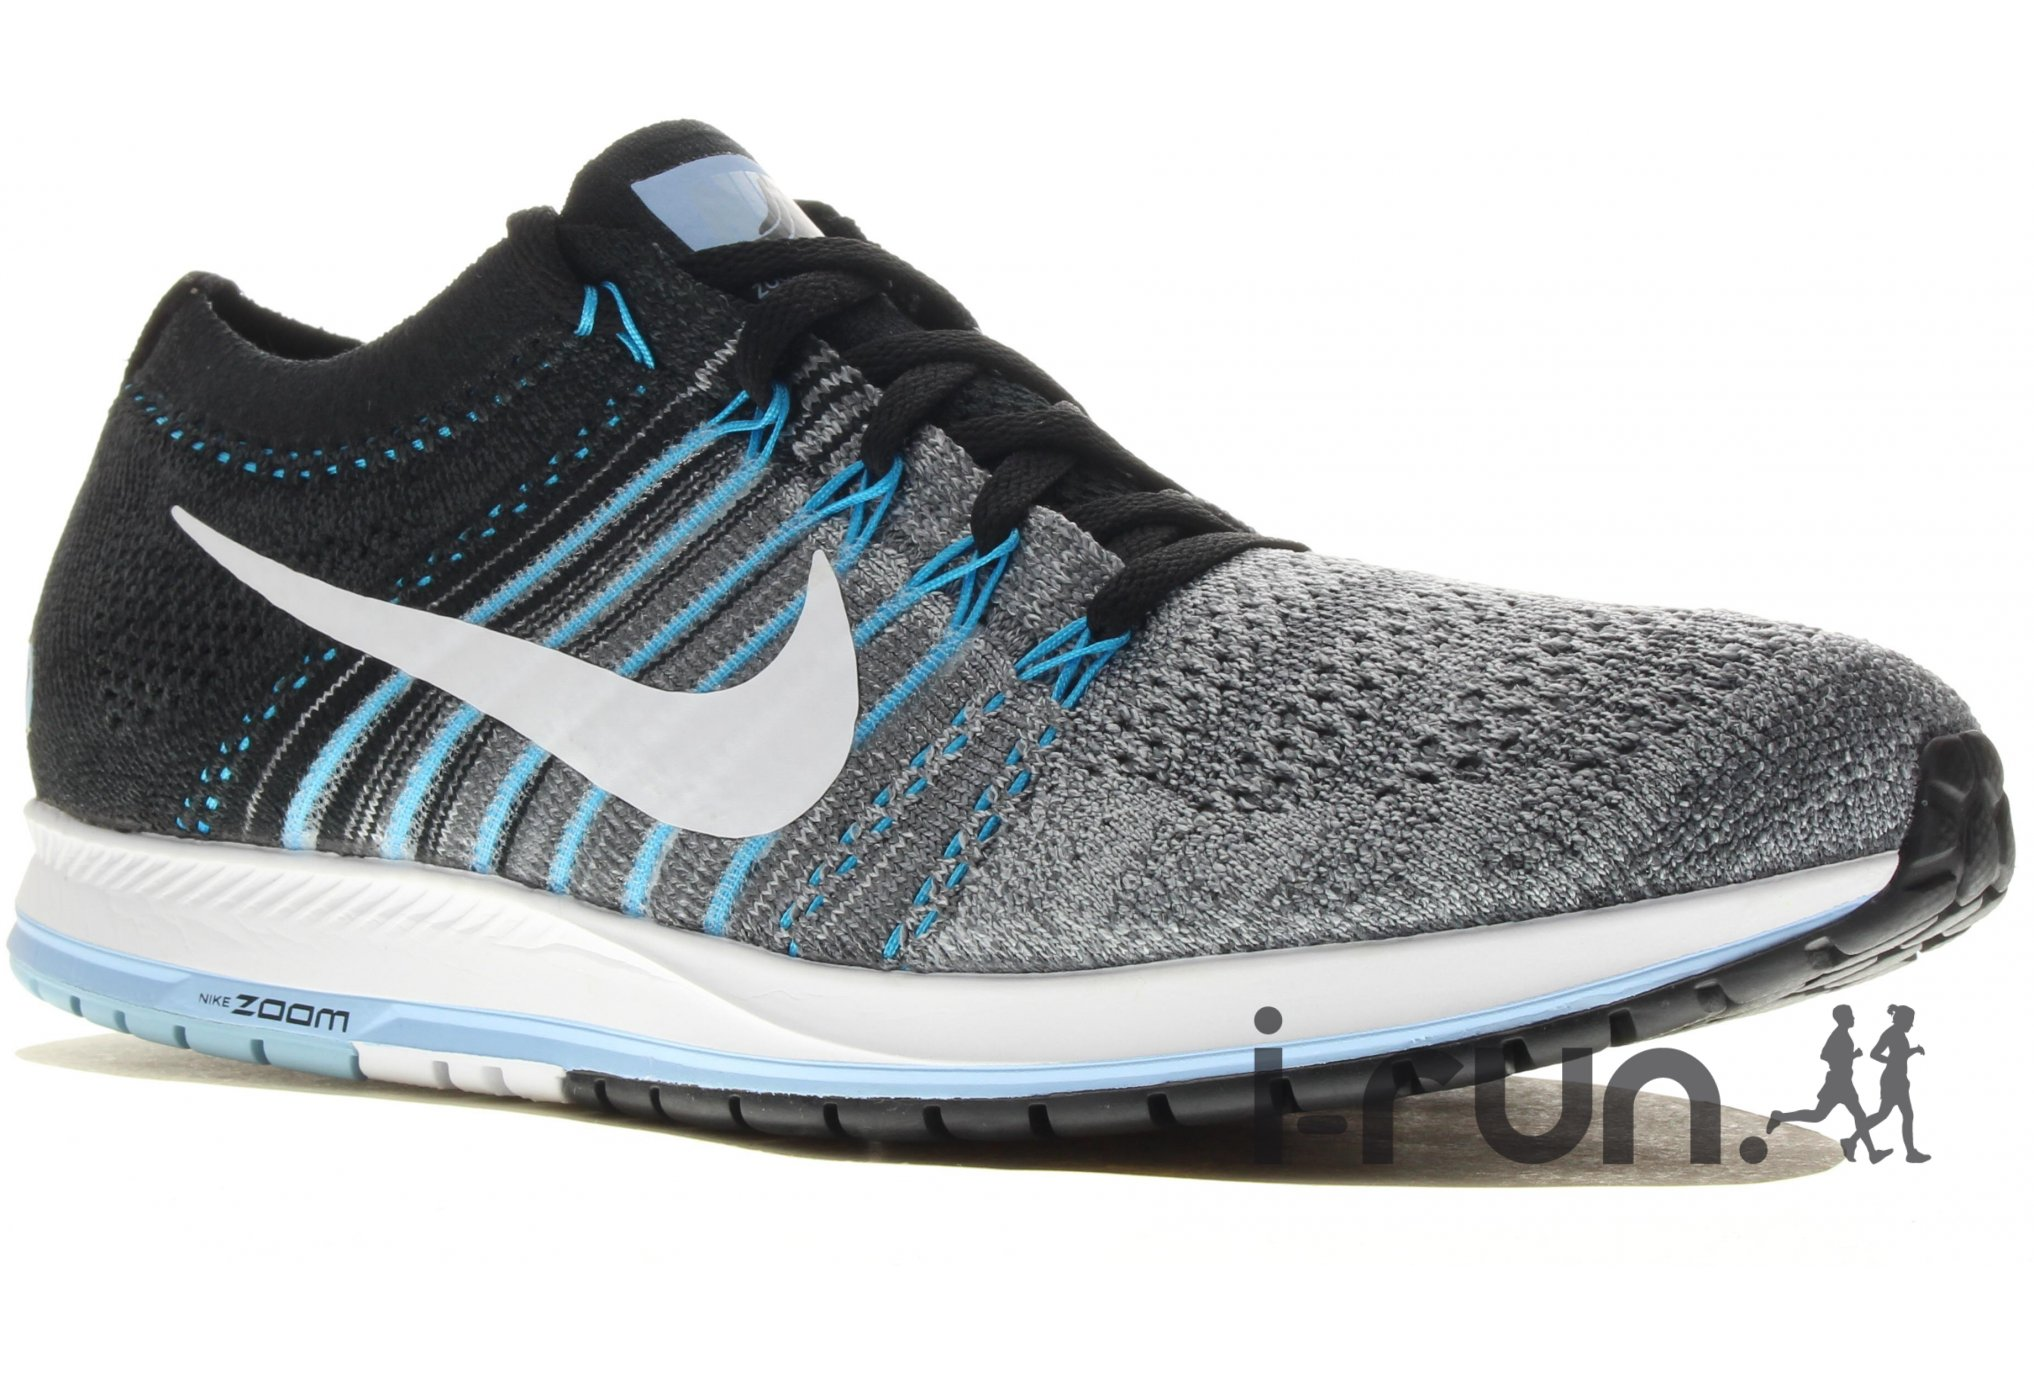 chaussures nike 6.0 brazen hiver 2010